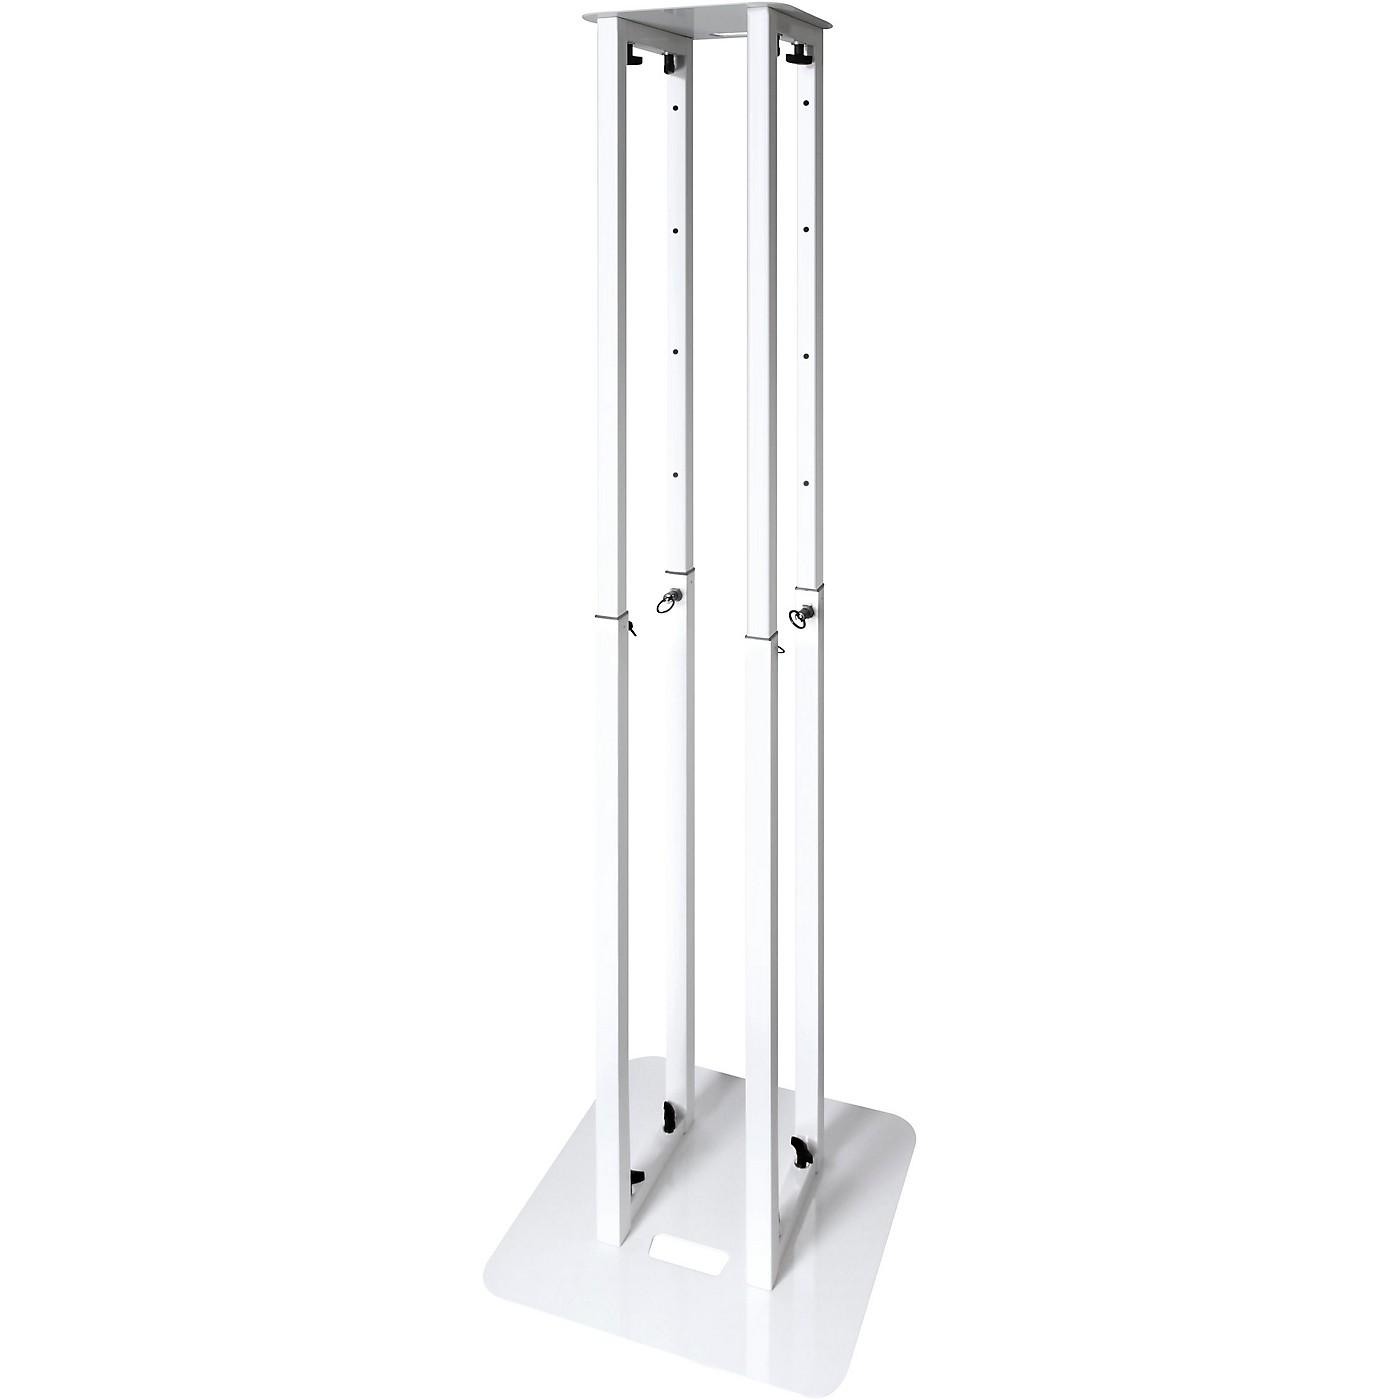 Novopro PS1 XL Adjustable Podium Stand thumbnail